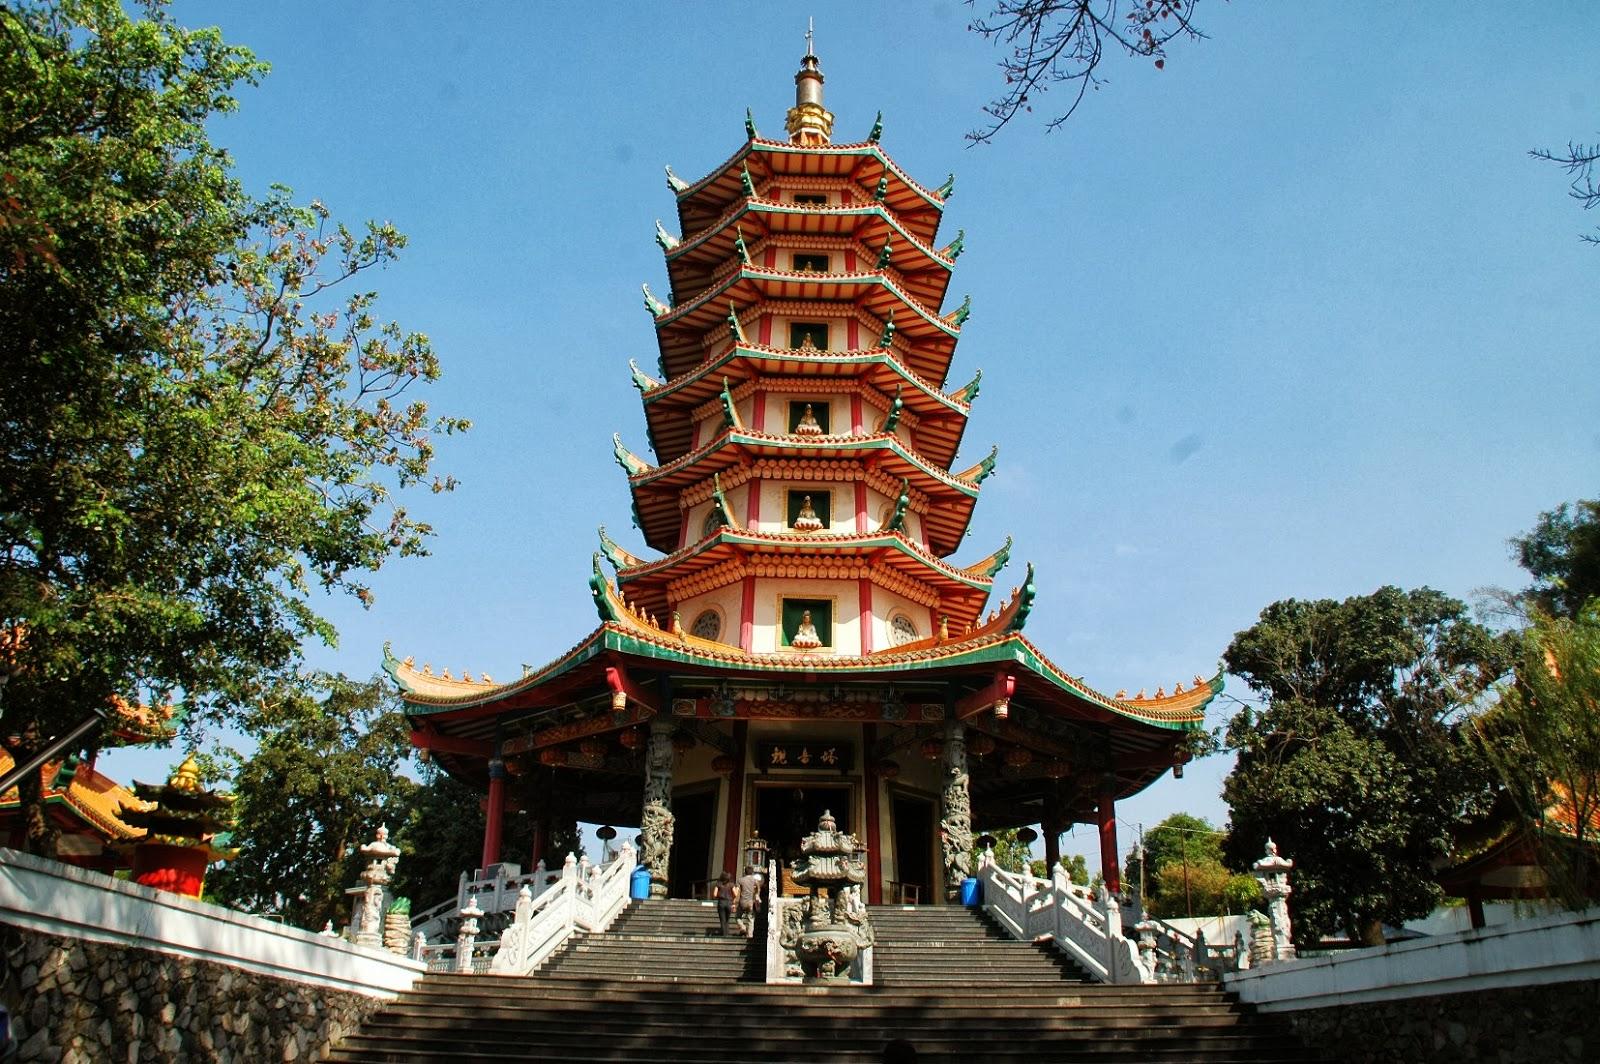 5 Destinasi Wisata Semarang Vihara Buddhagaya Watugong Klenteng Avalokitesvara Kab